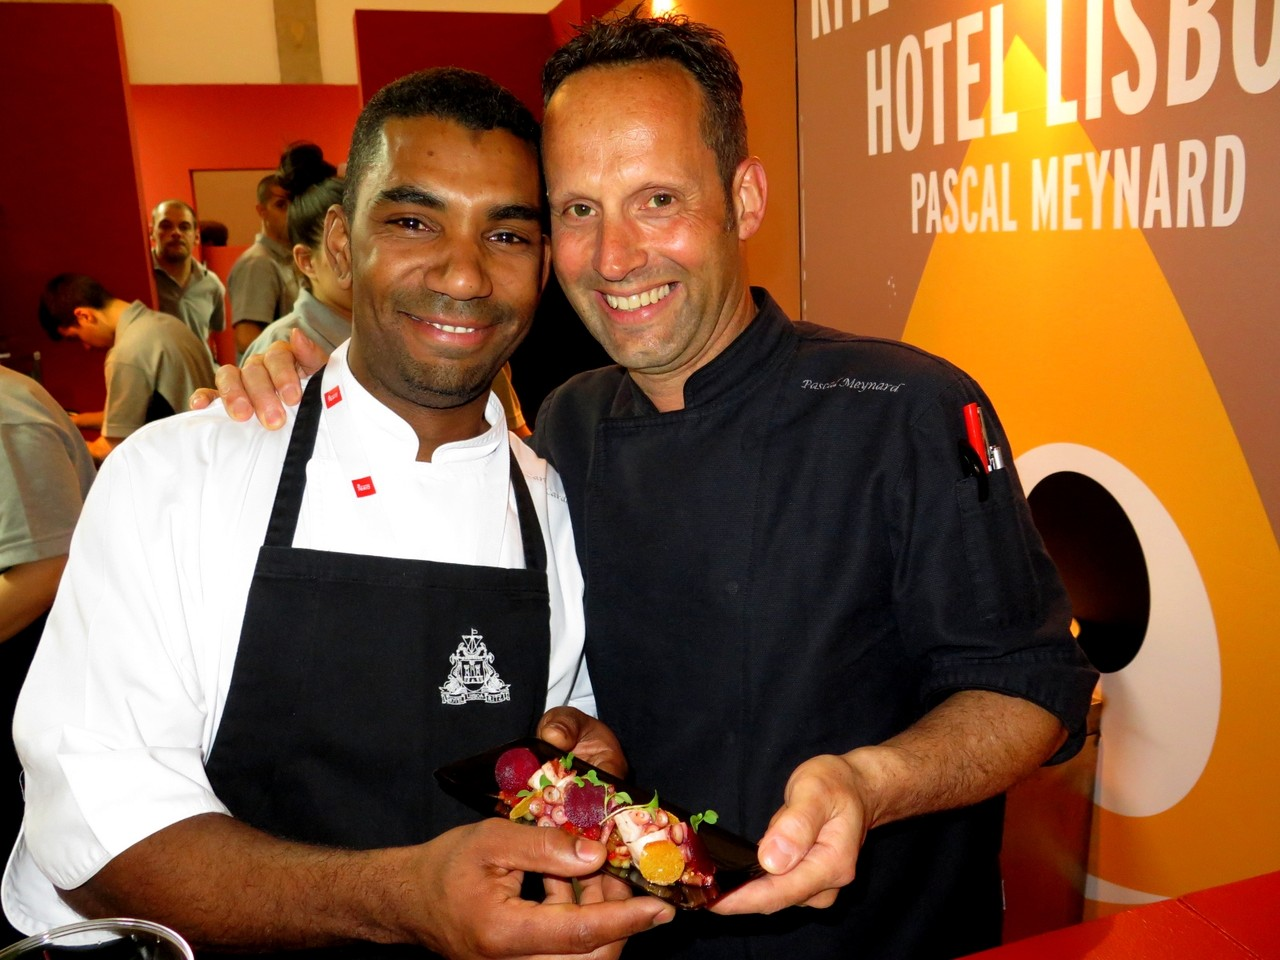 Carlos Cardoso e Pascal Meynard